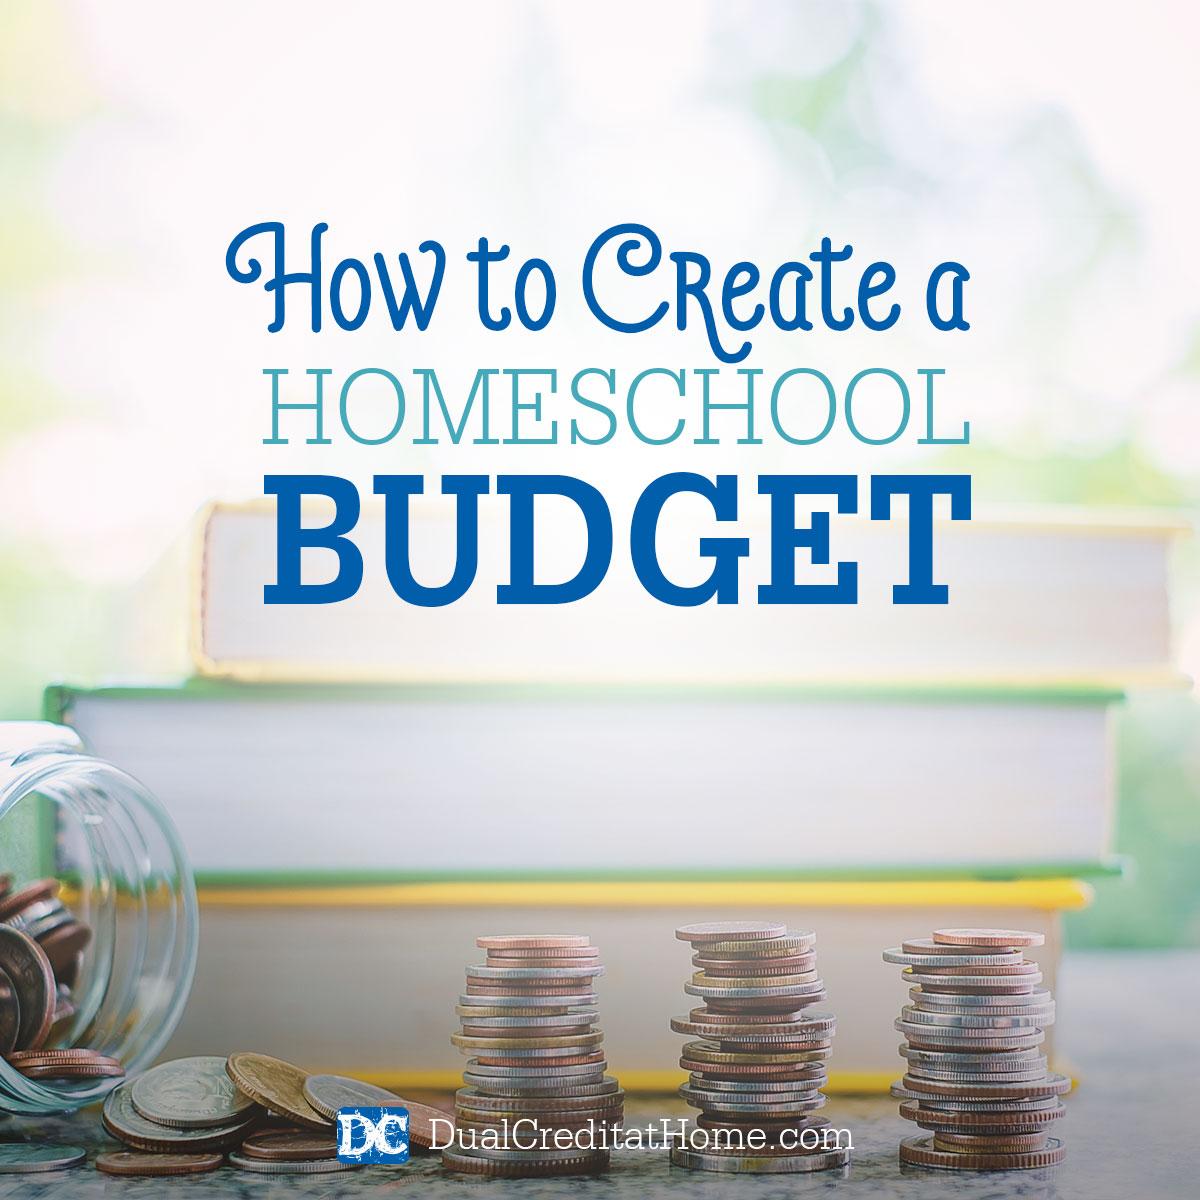 How to Create a Homeschool Budget